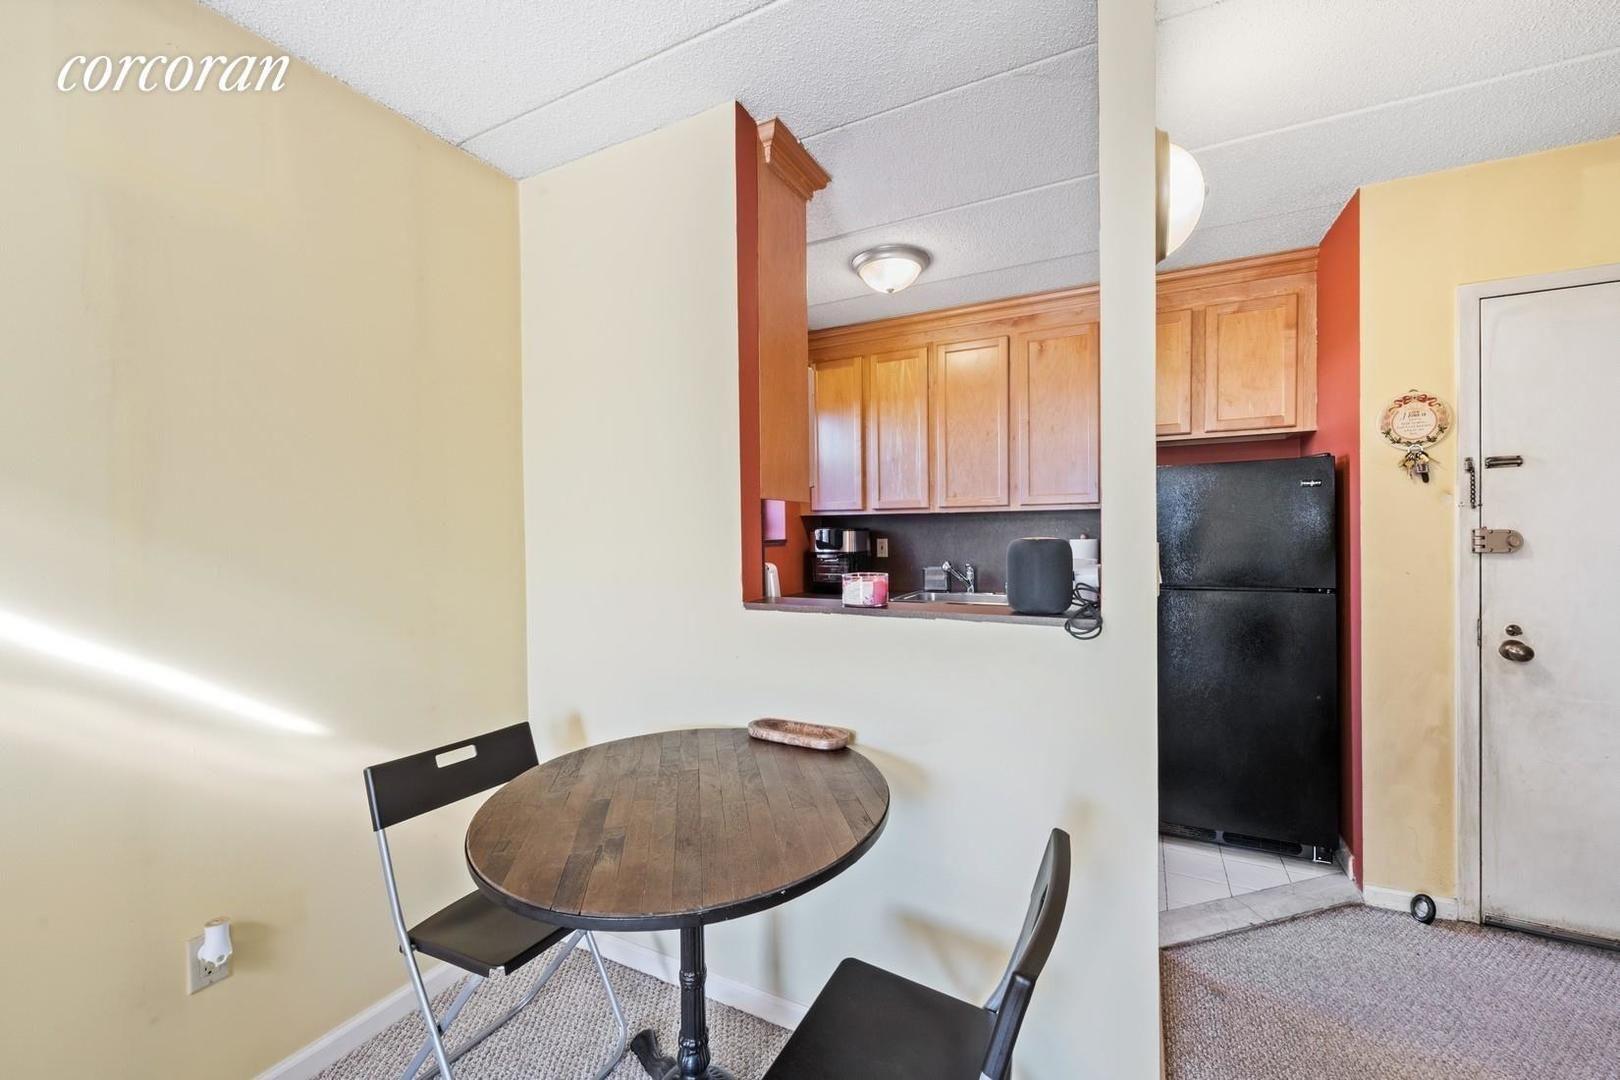 Apartment for sale at 108-49 Seaview Avenue, Apt 29E